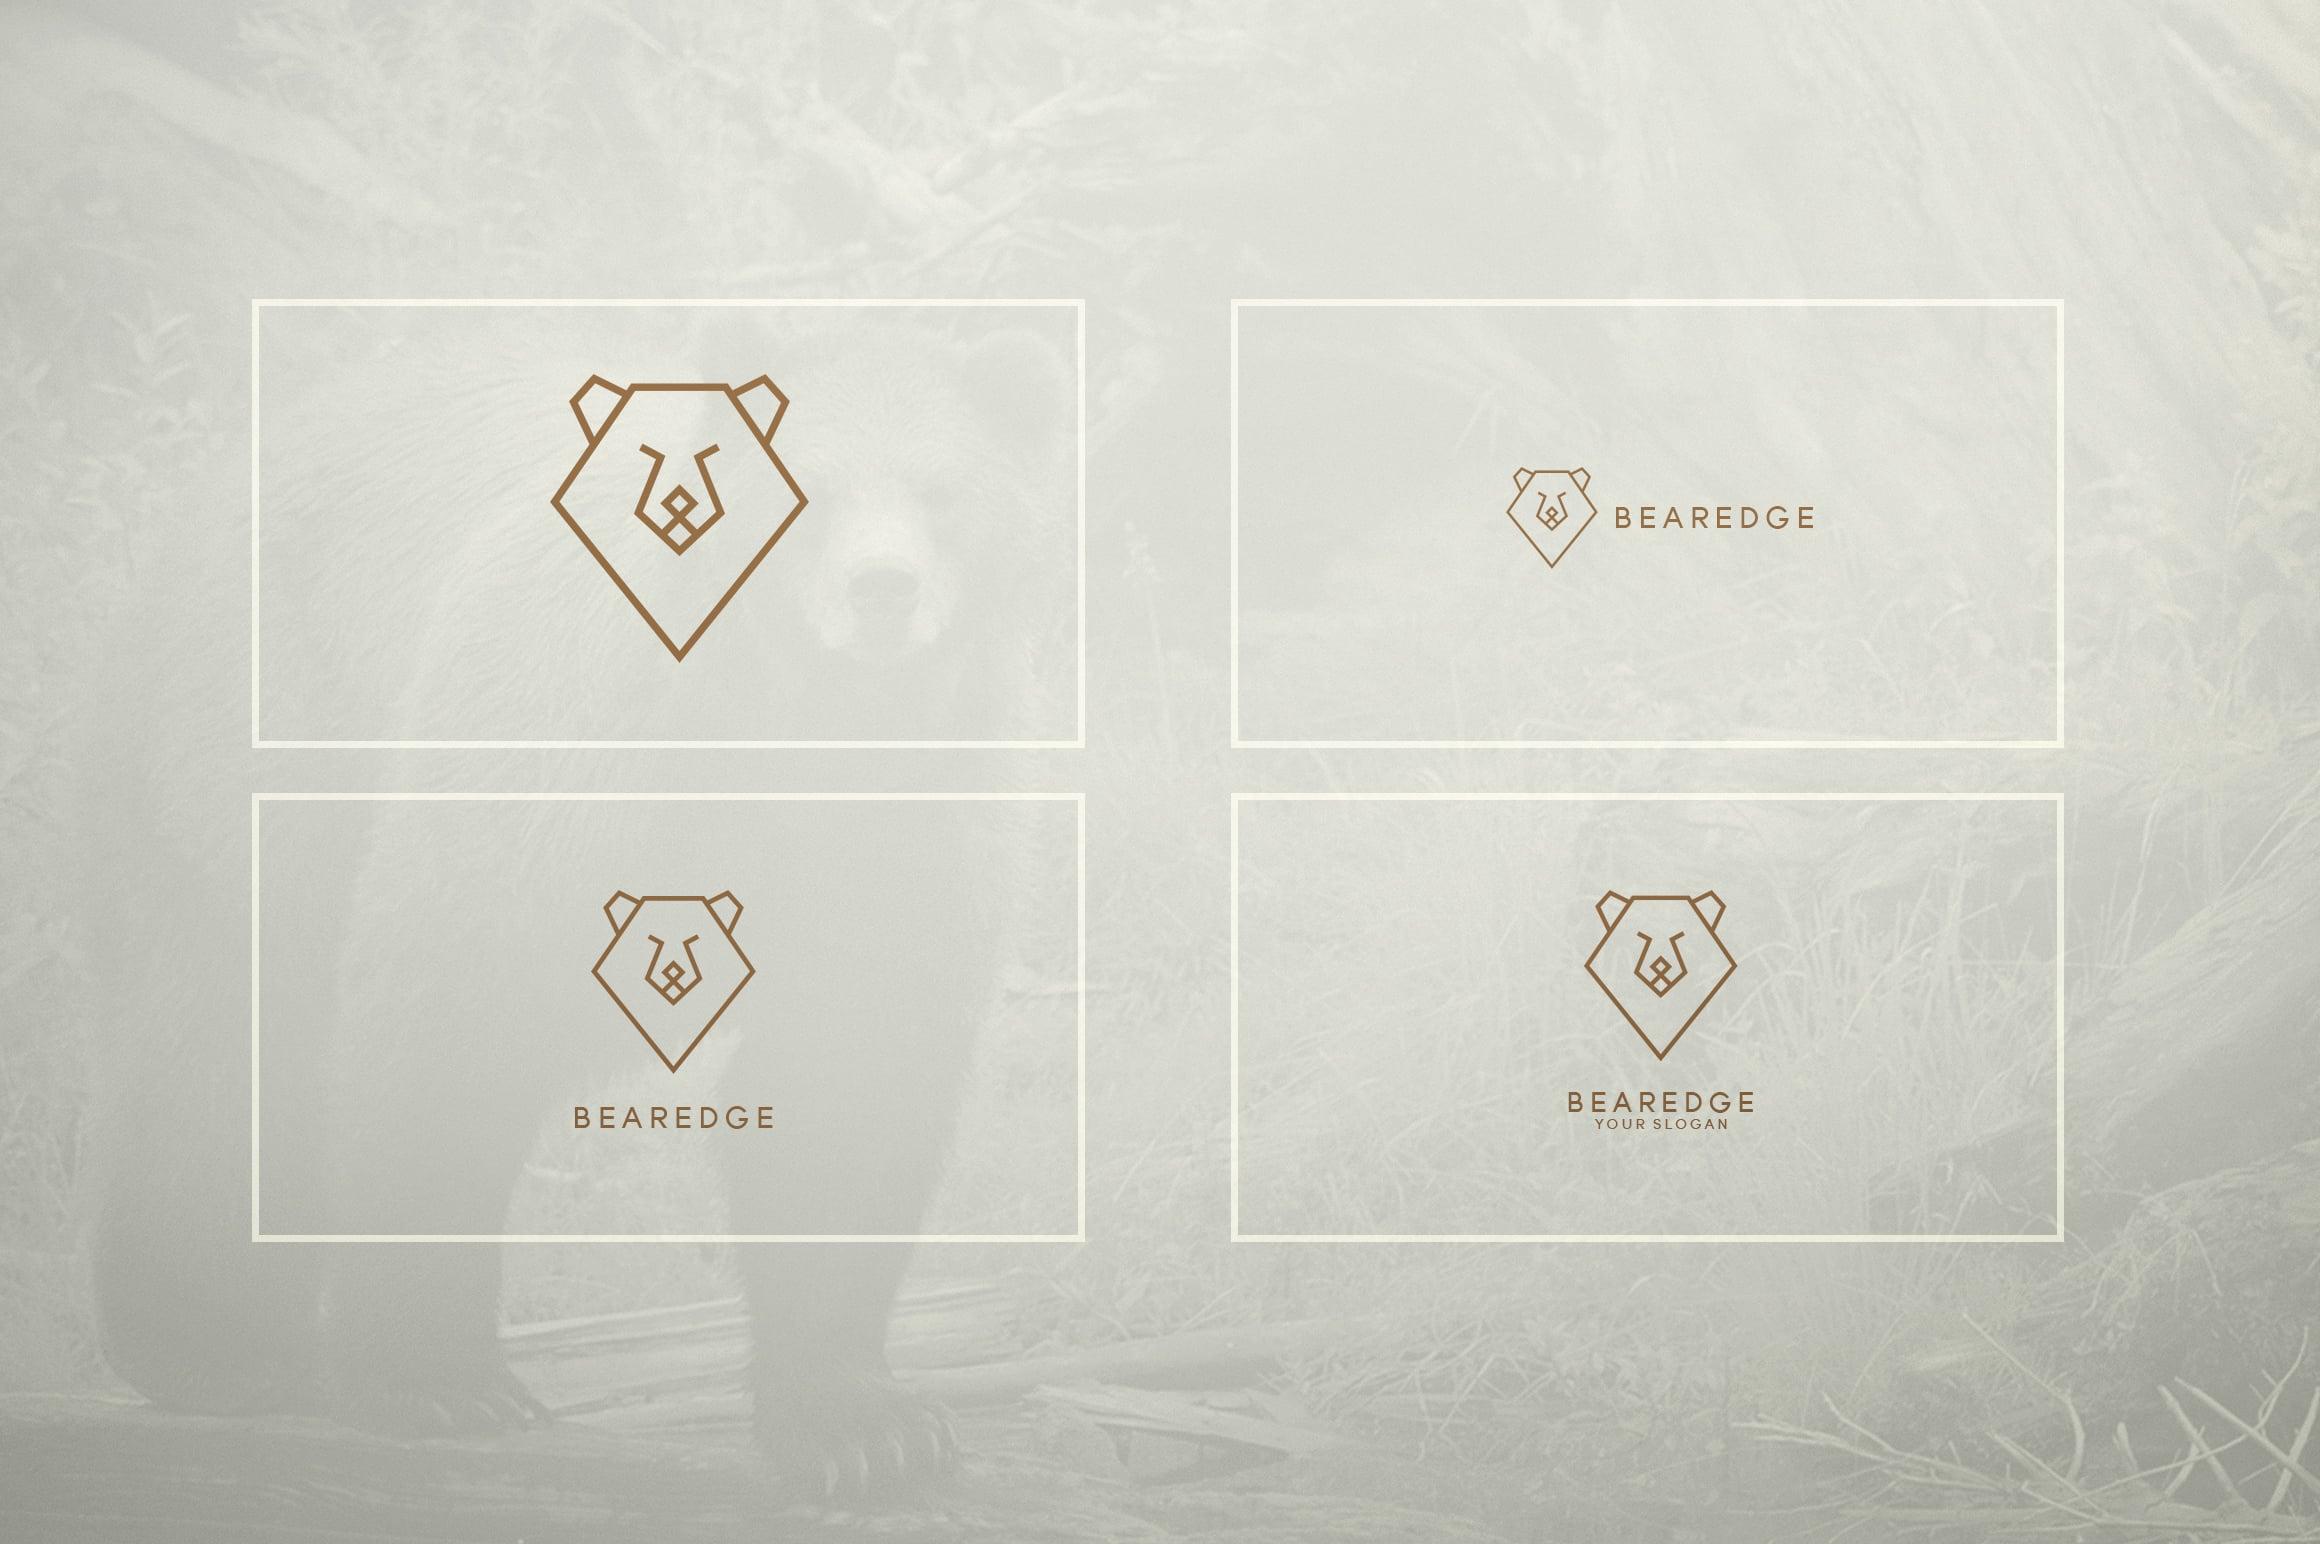 17 Geometric Animal Icons and Logos - 9